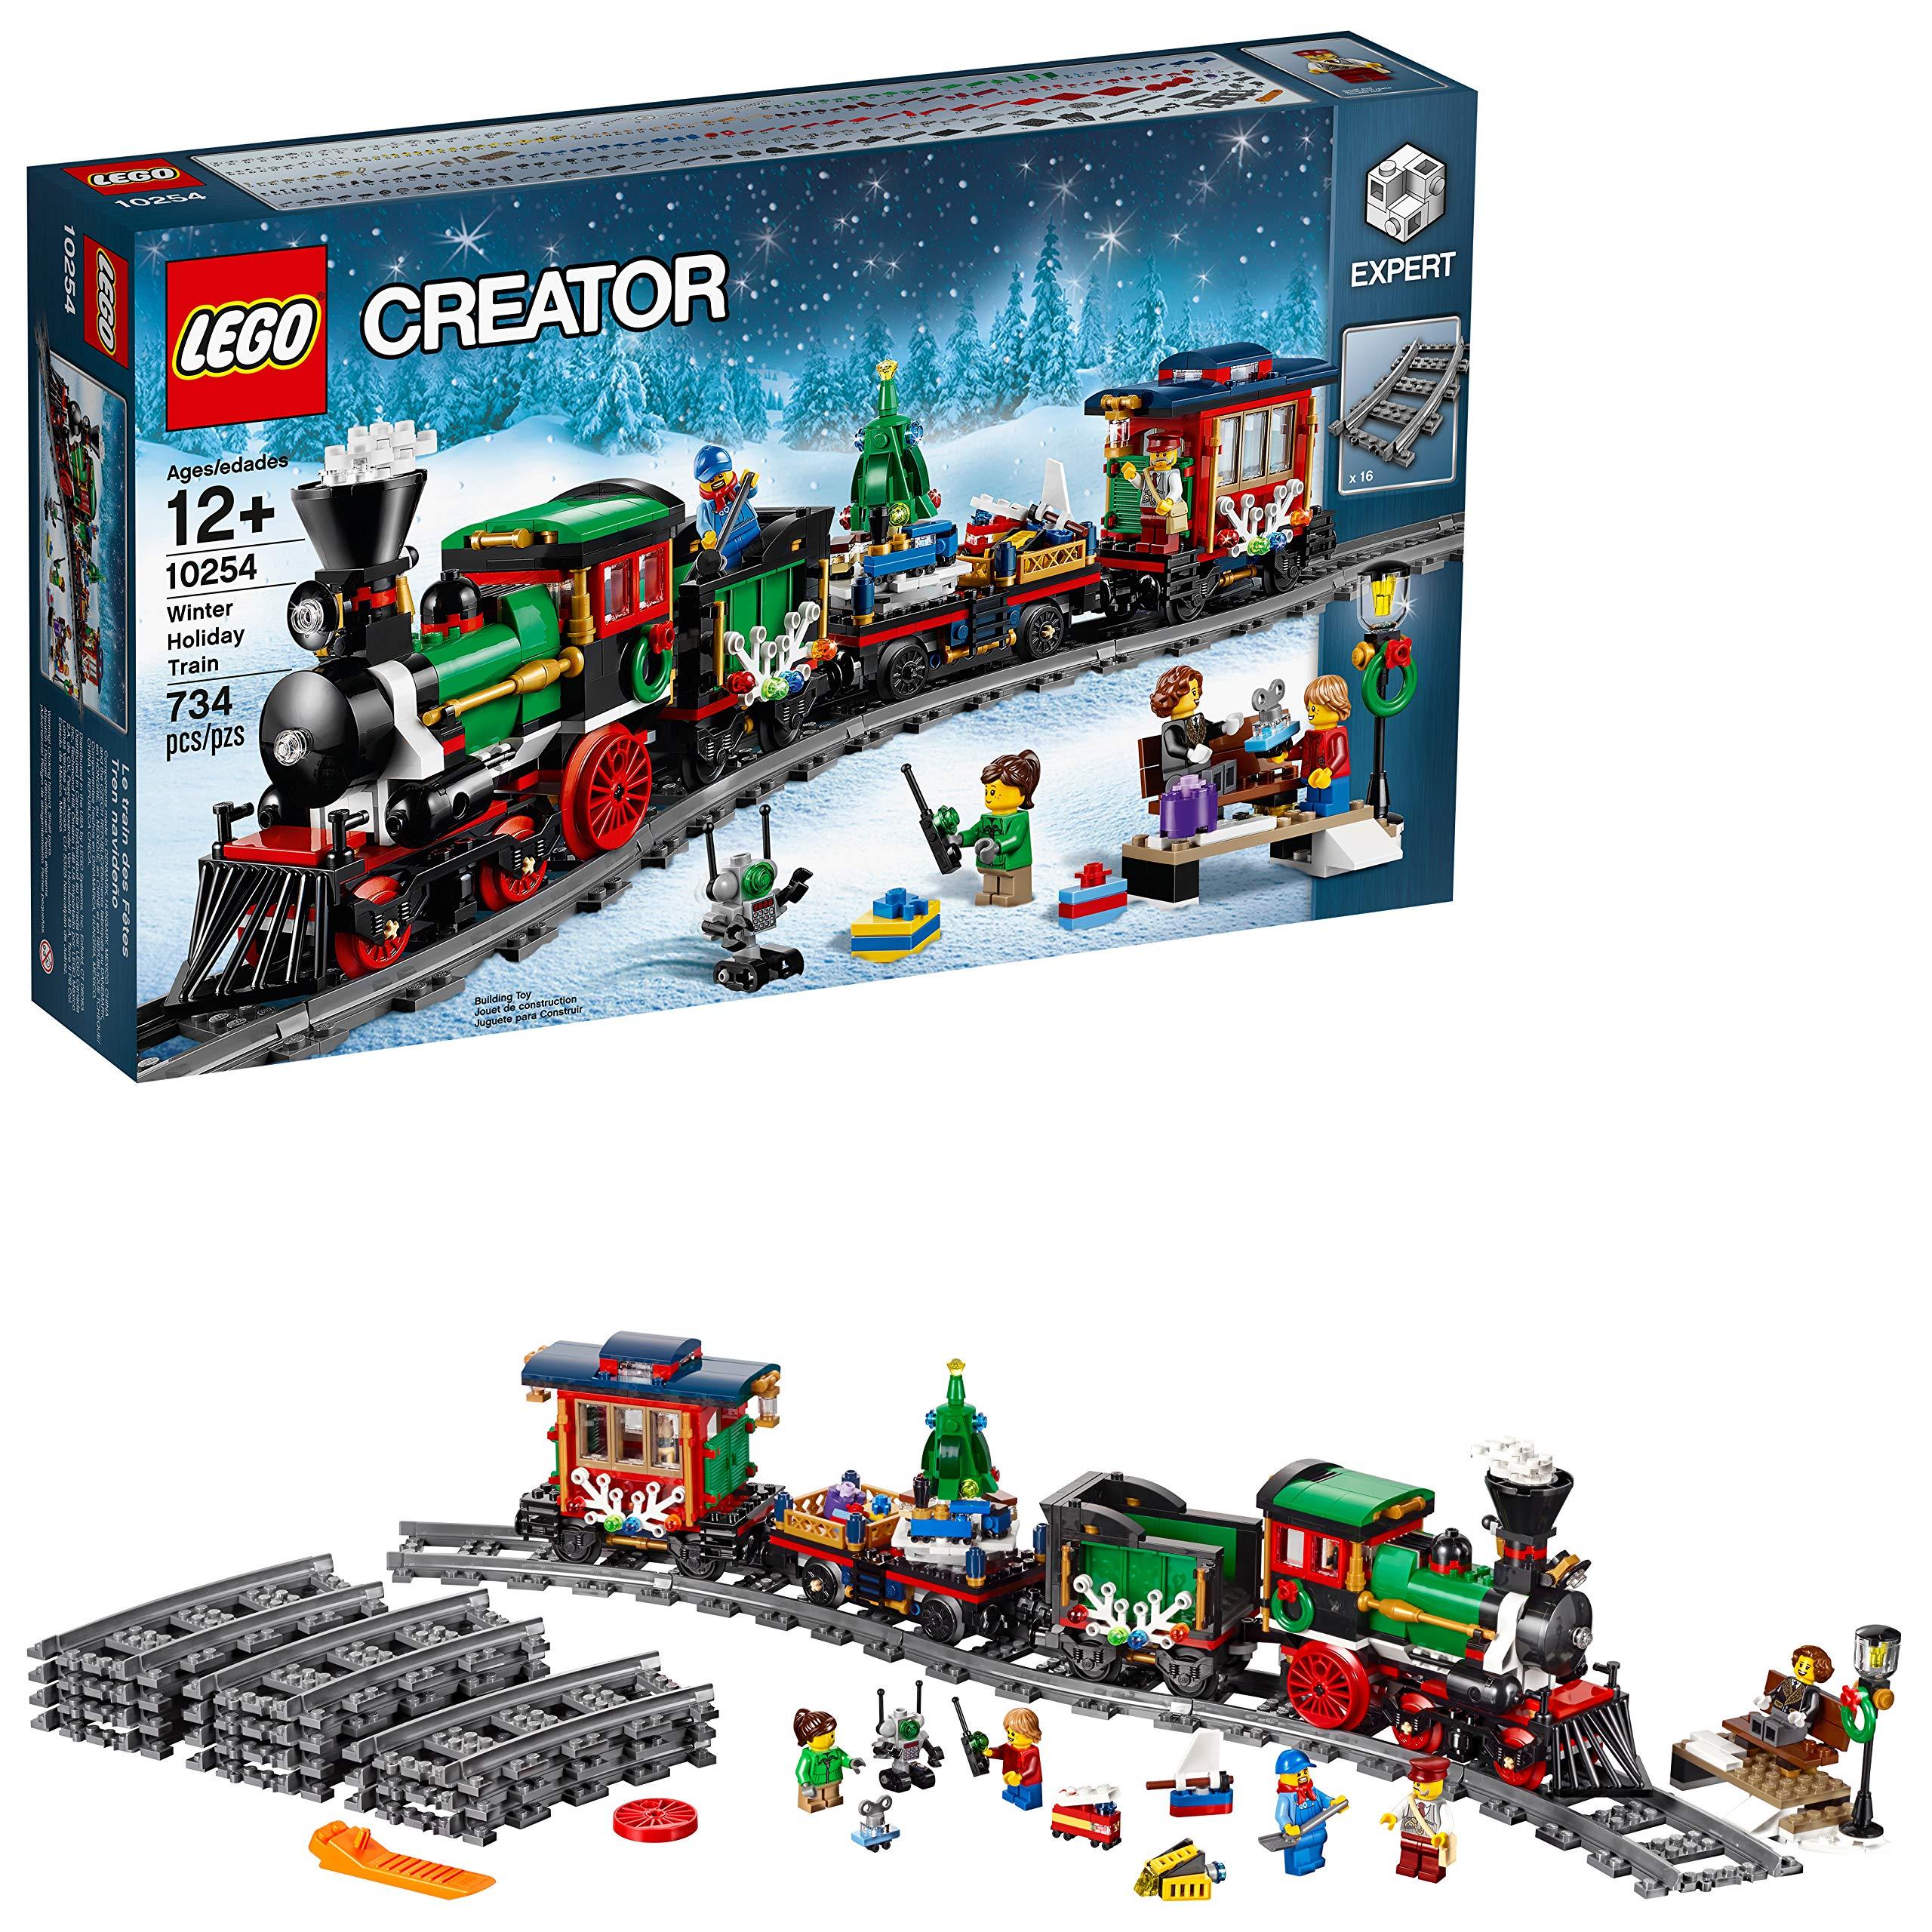 Lego Creator Santa's M Expert Workshop10245Amazon cRjq35S4AL